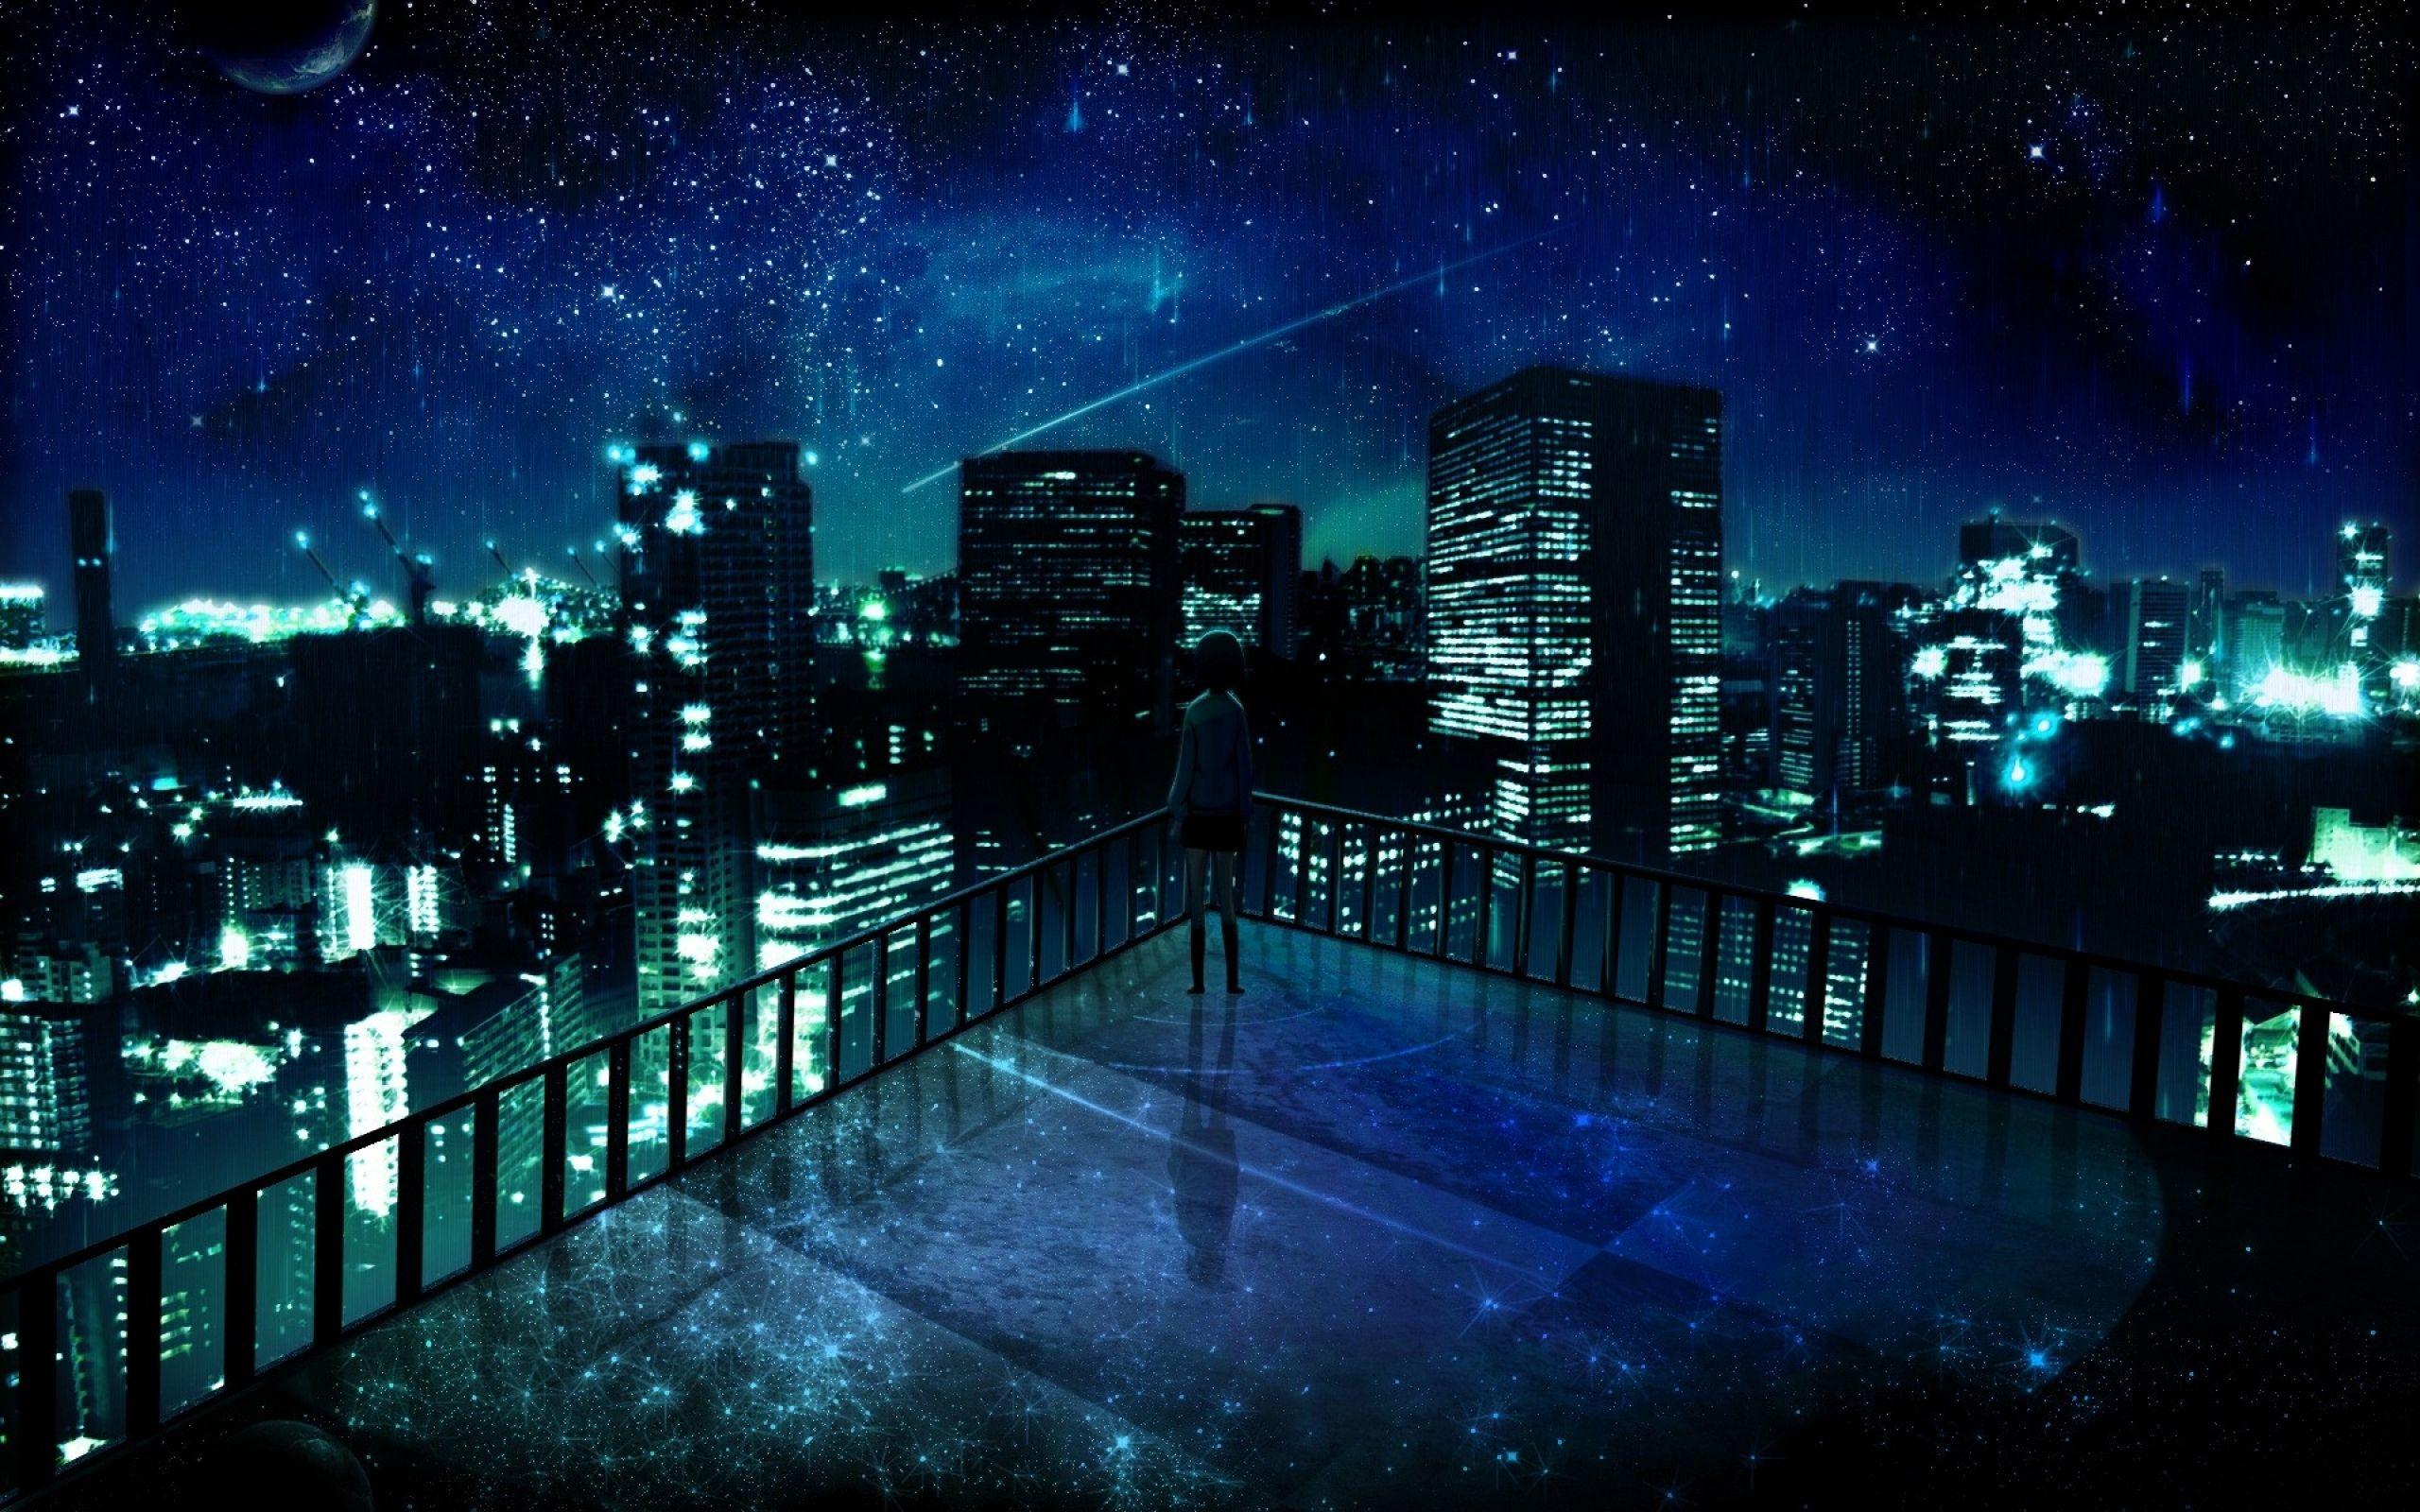 pin city nightlife wallpaper - photo #18